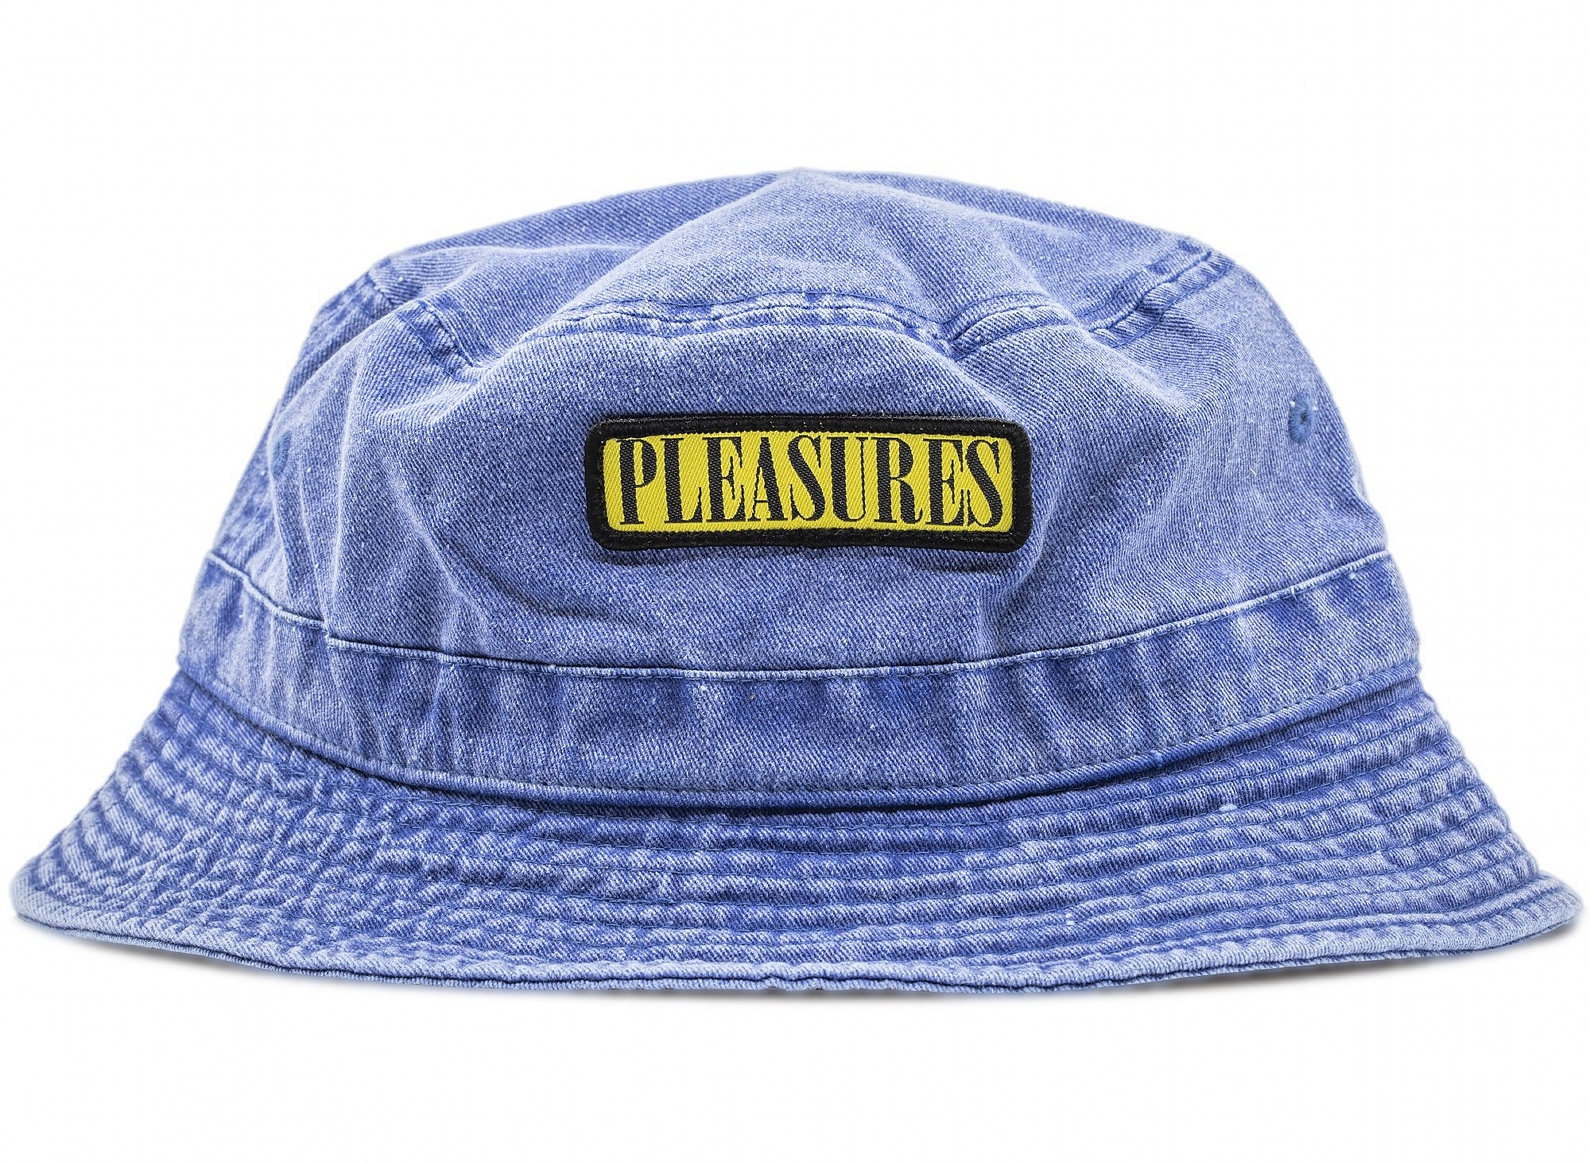 【PLEASURES/プレジャーズ】SPANK BUCKET HAT バケットハット / WASHED BLUE